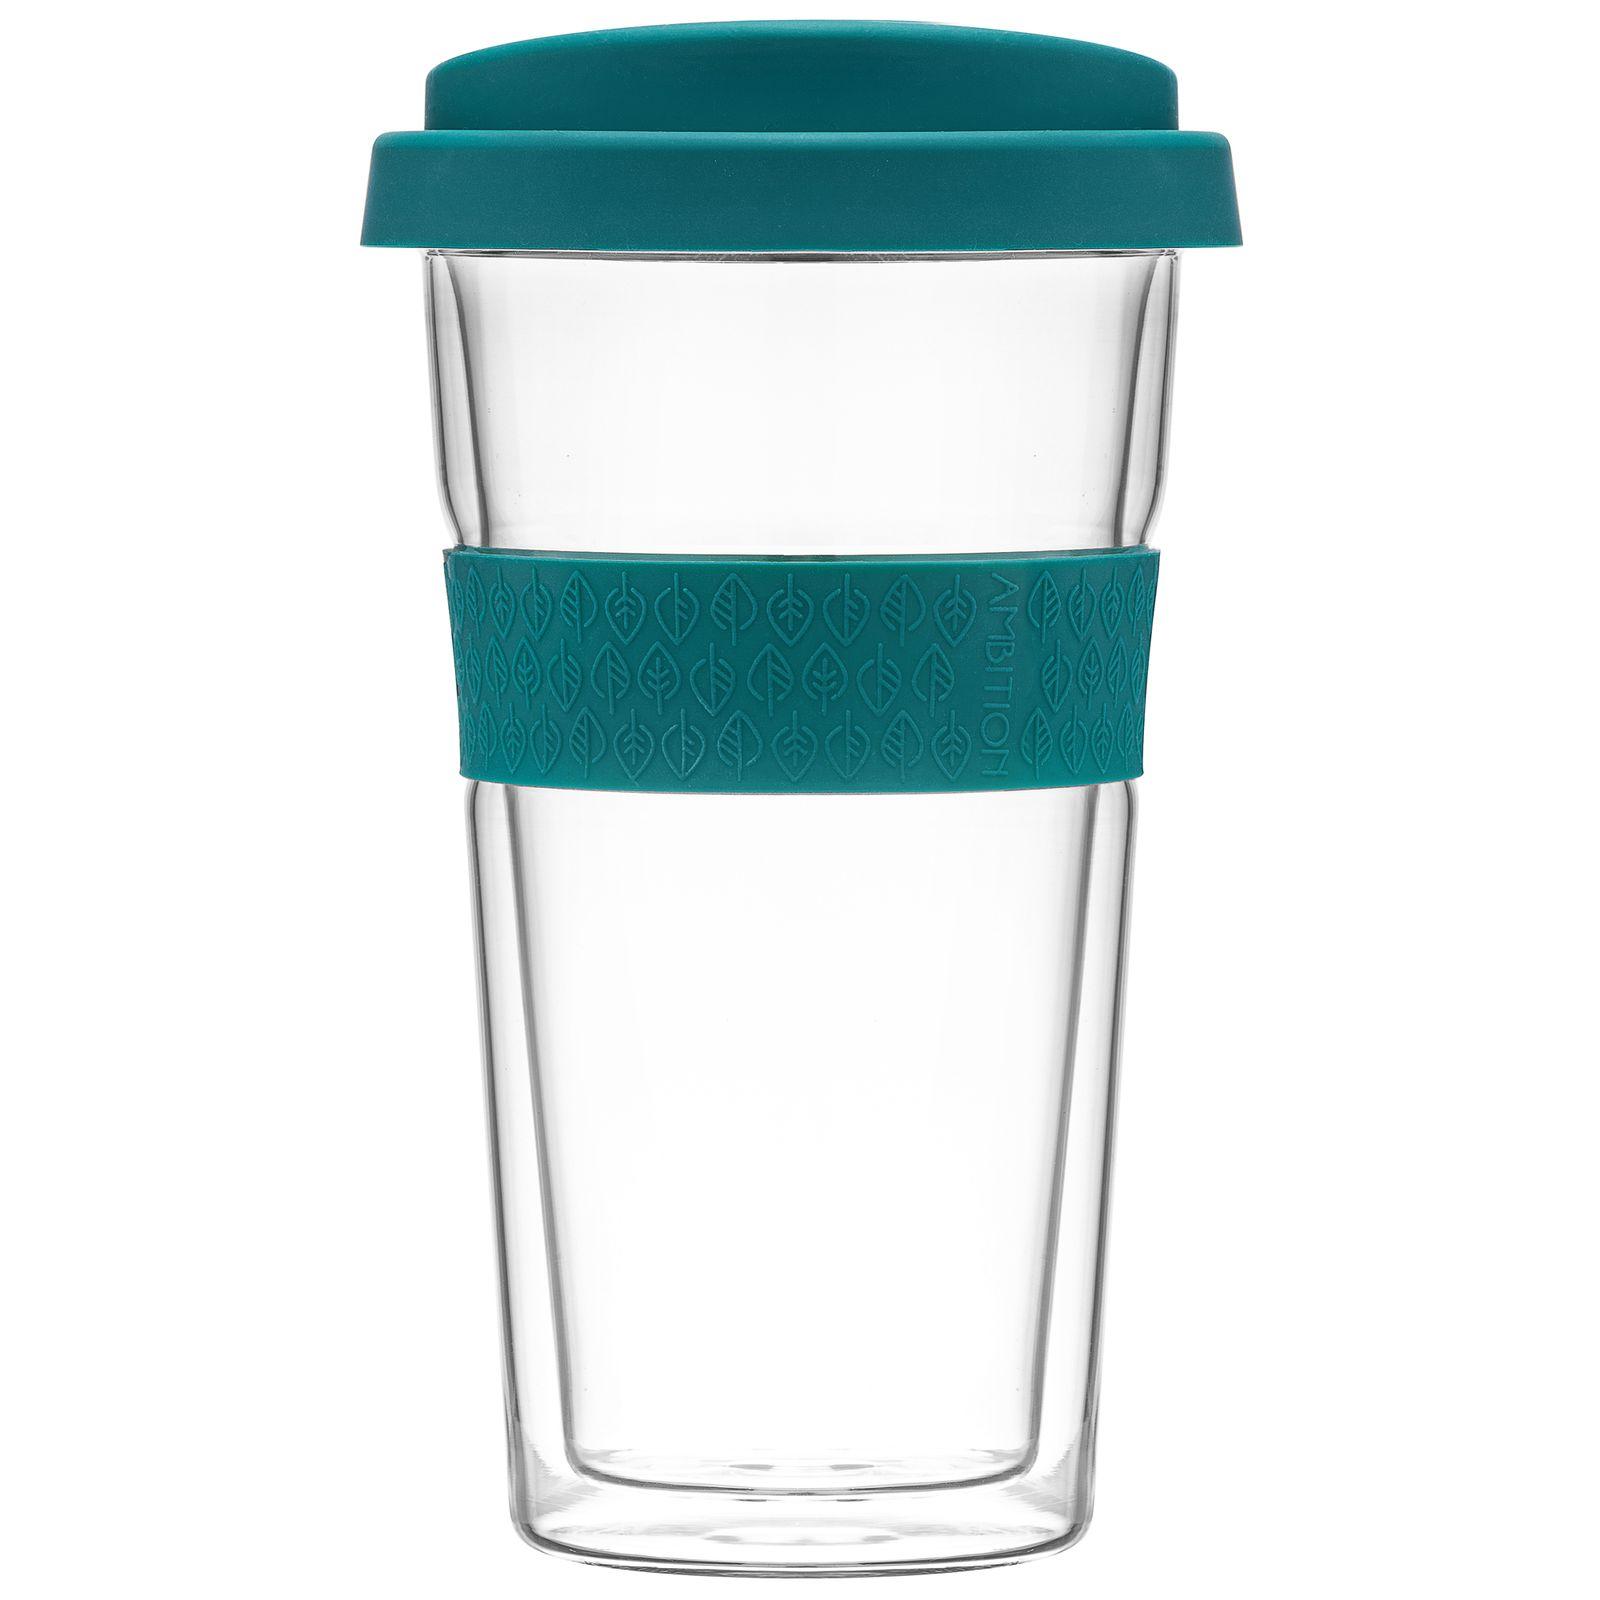 Kubek / szklanka termiczna z opaską Bizet 400 ml Emerald AMBITION